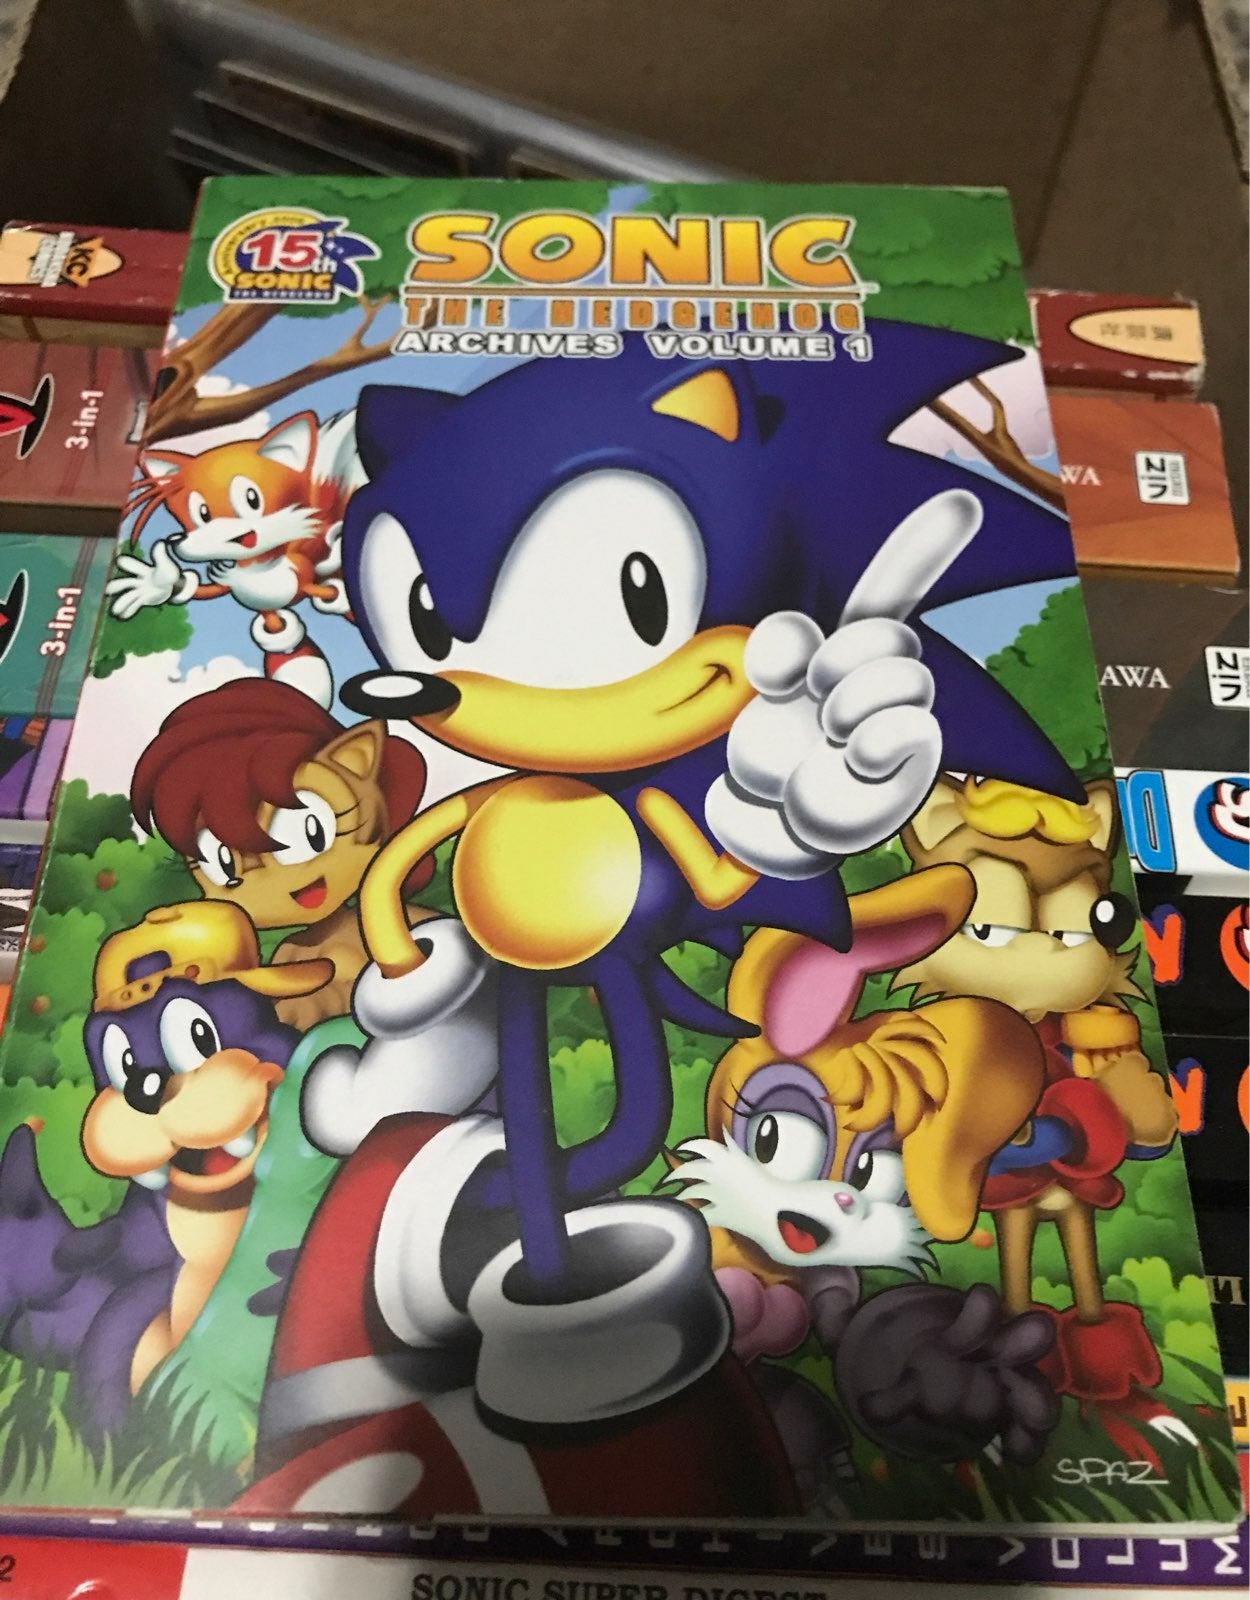 Sonic comic archives vol. 1